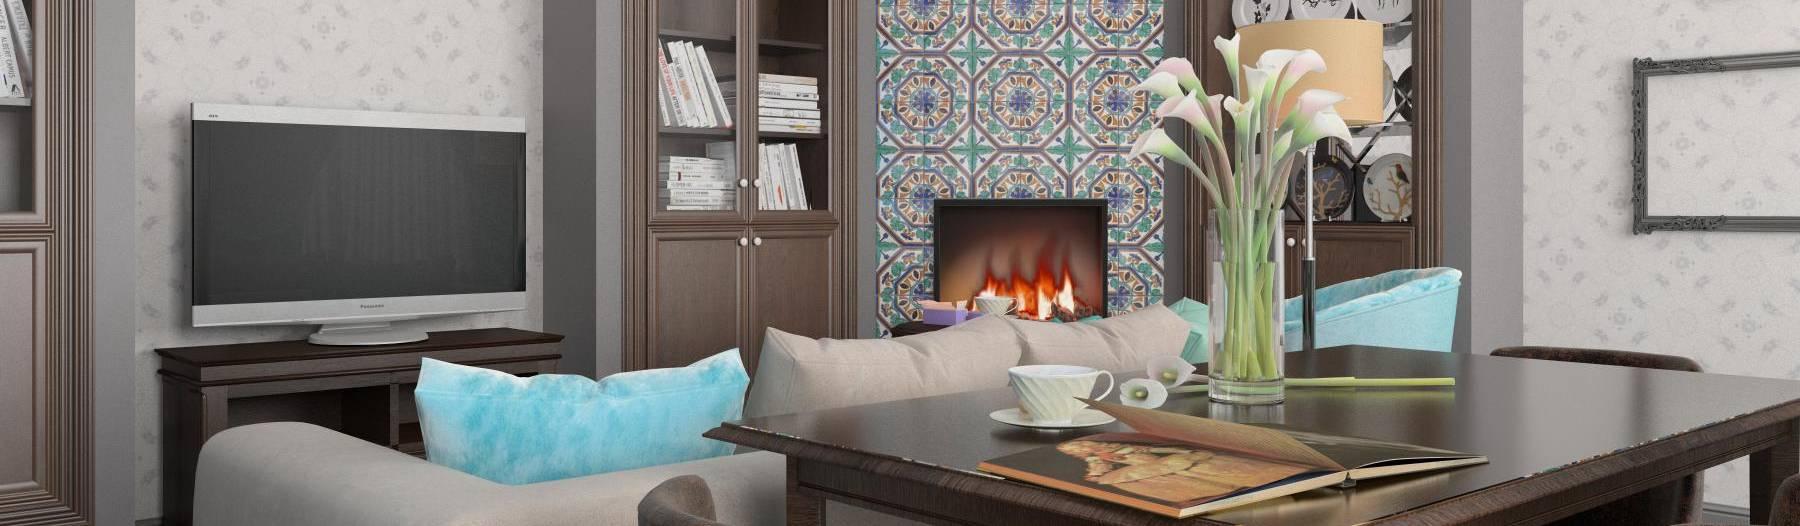 Design interior OLGA MUDRYAKOVA